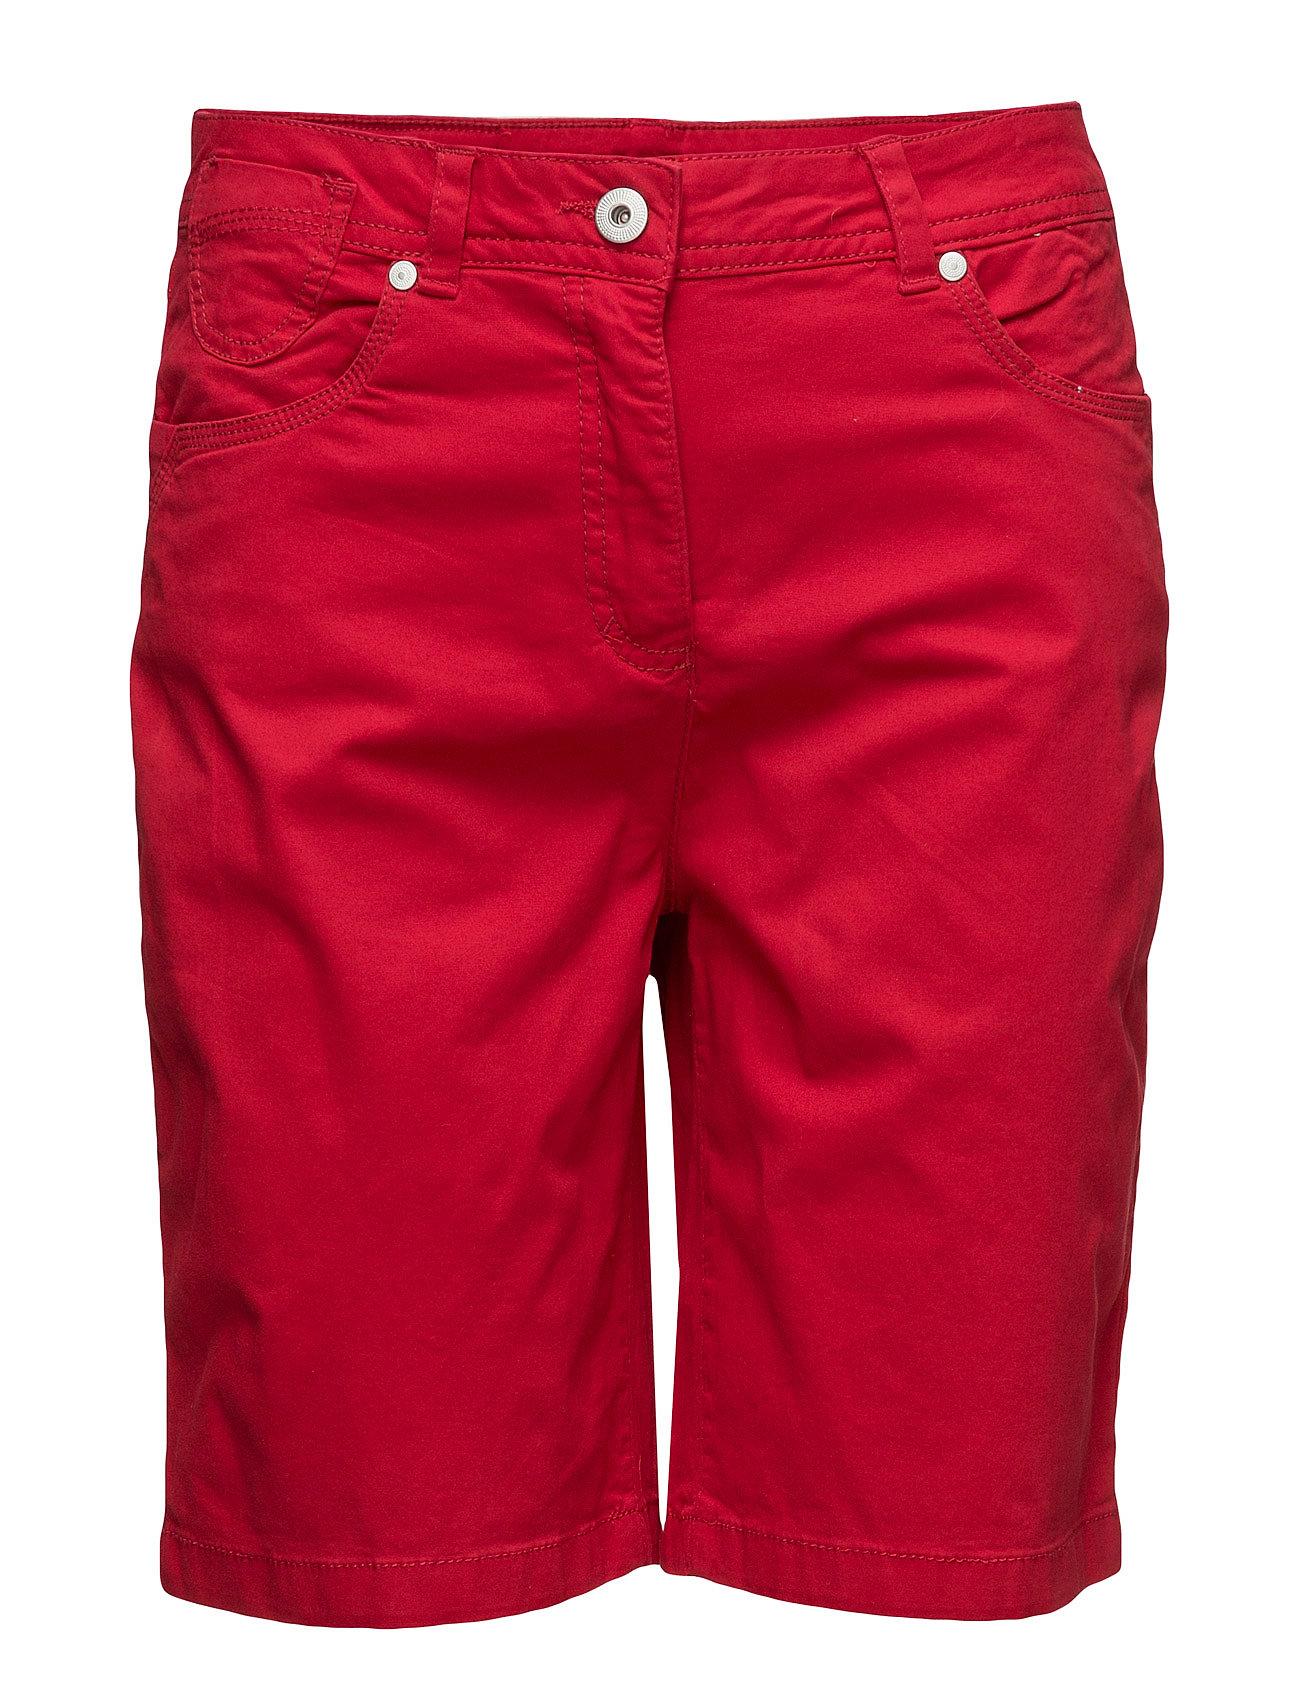 Casual Shorts Brandtex Shorts til Kvinder i Rød